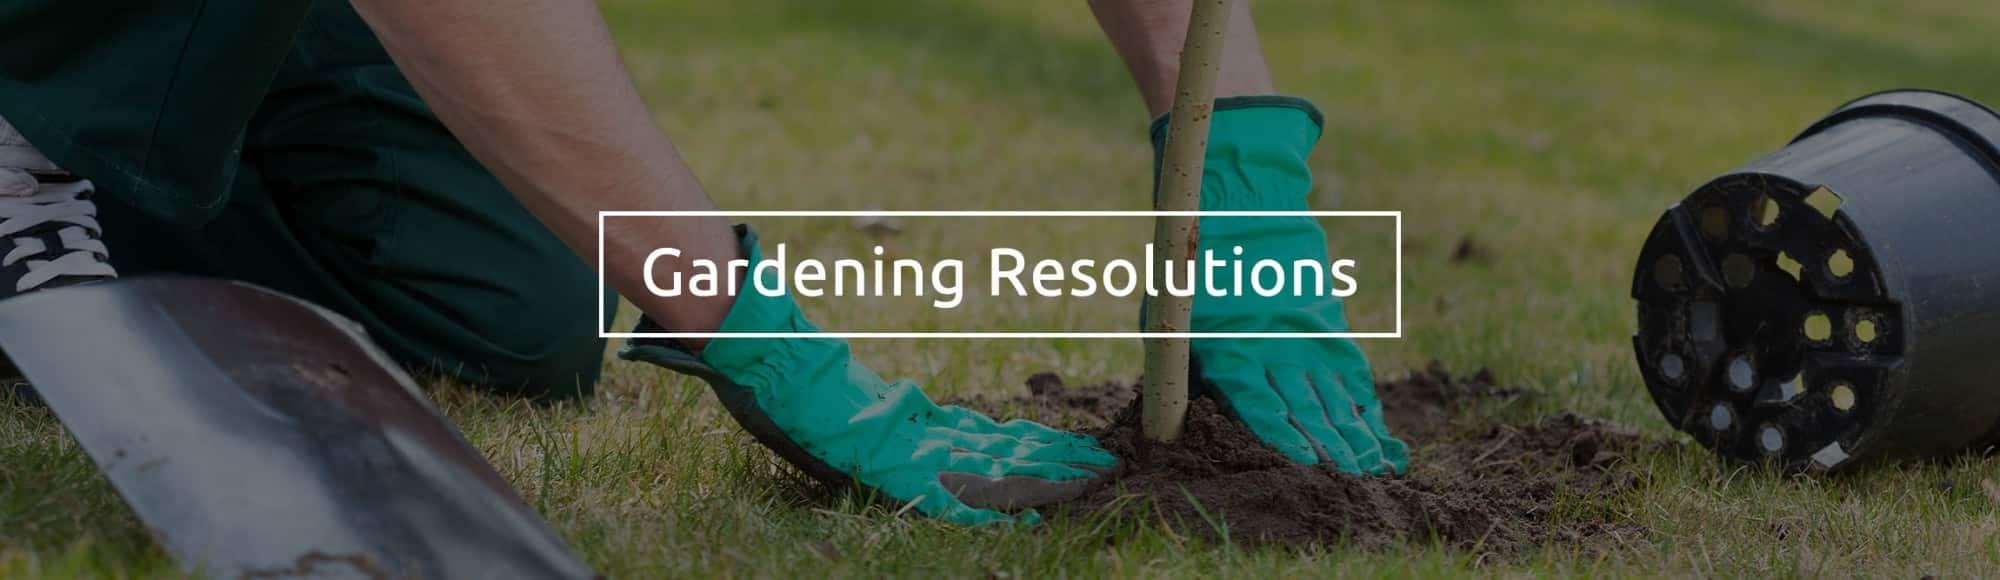 gardening-resolutions